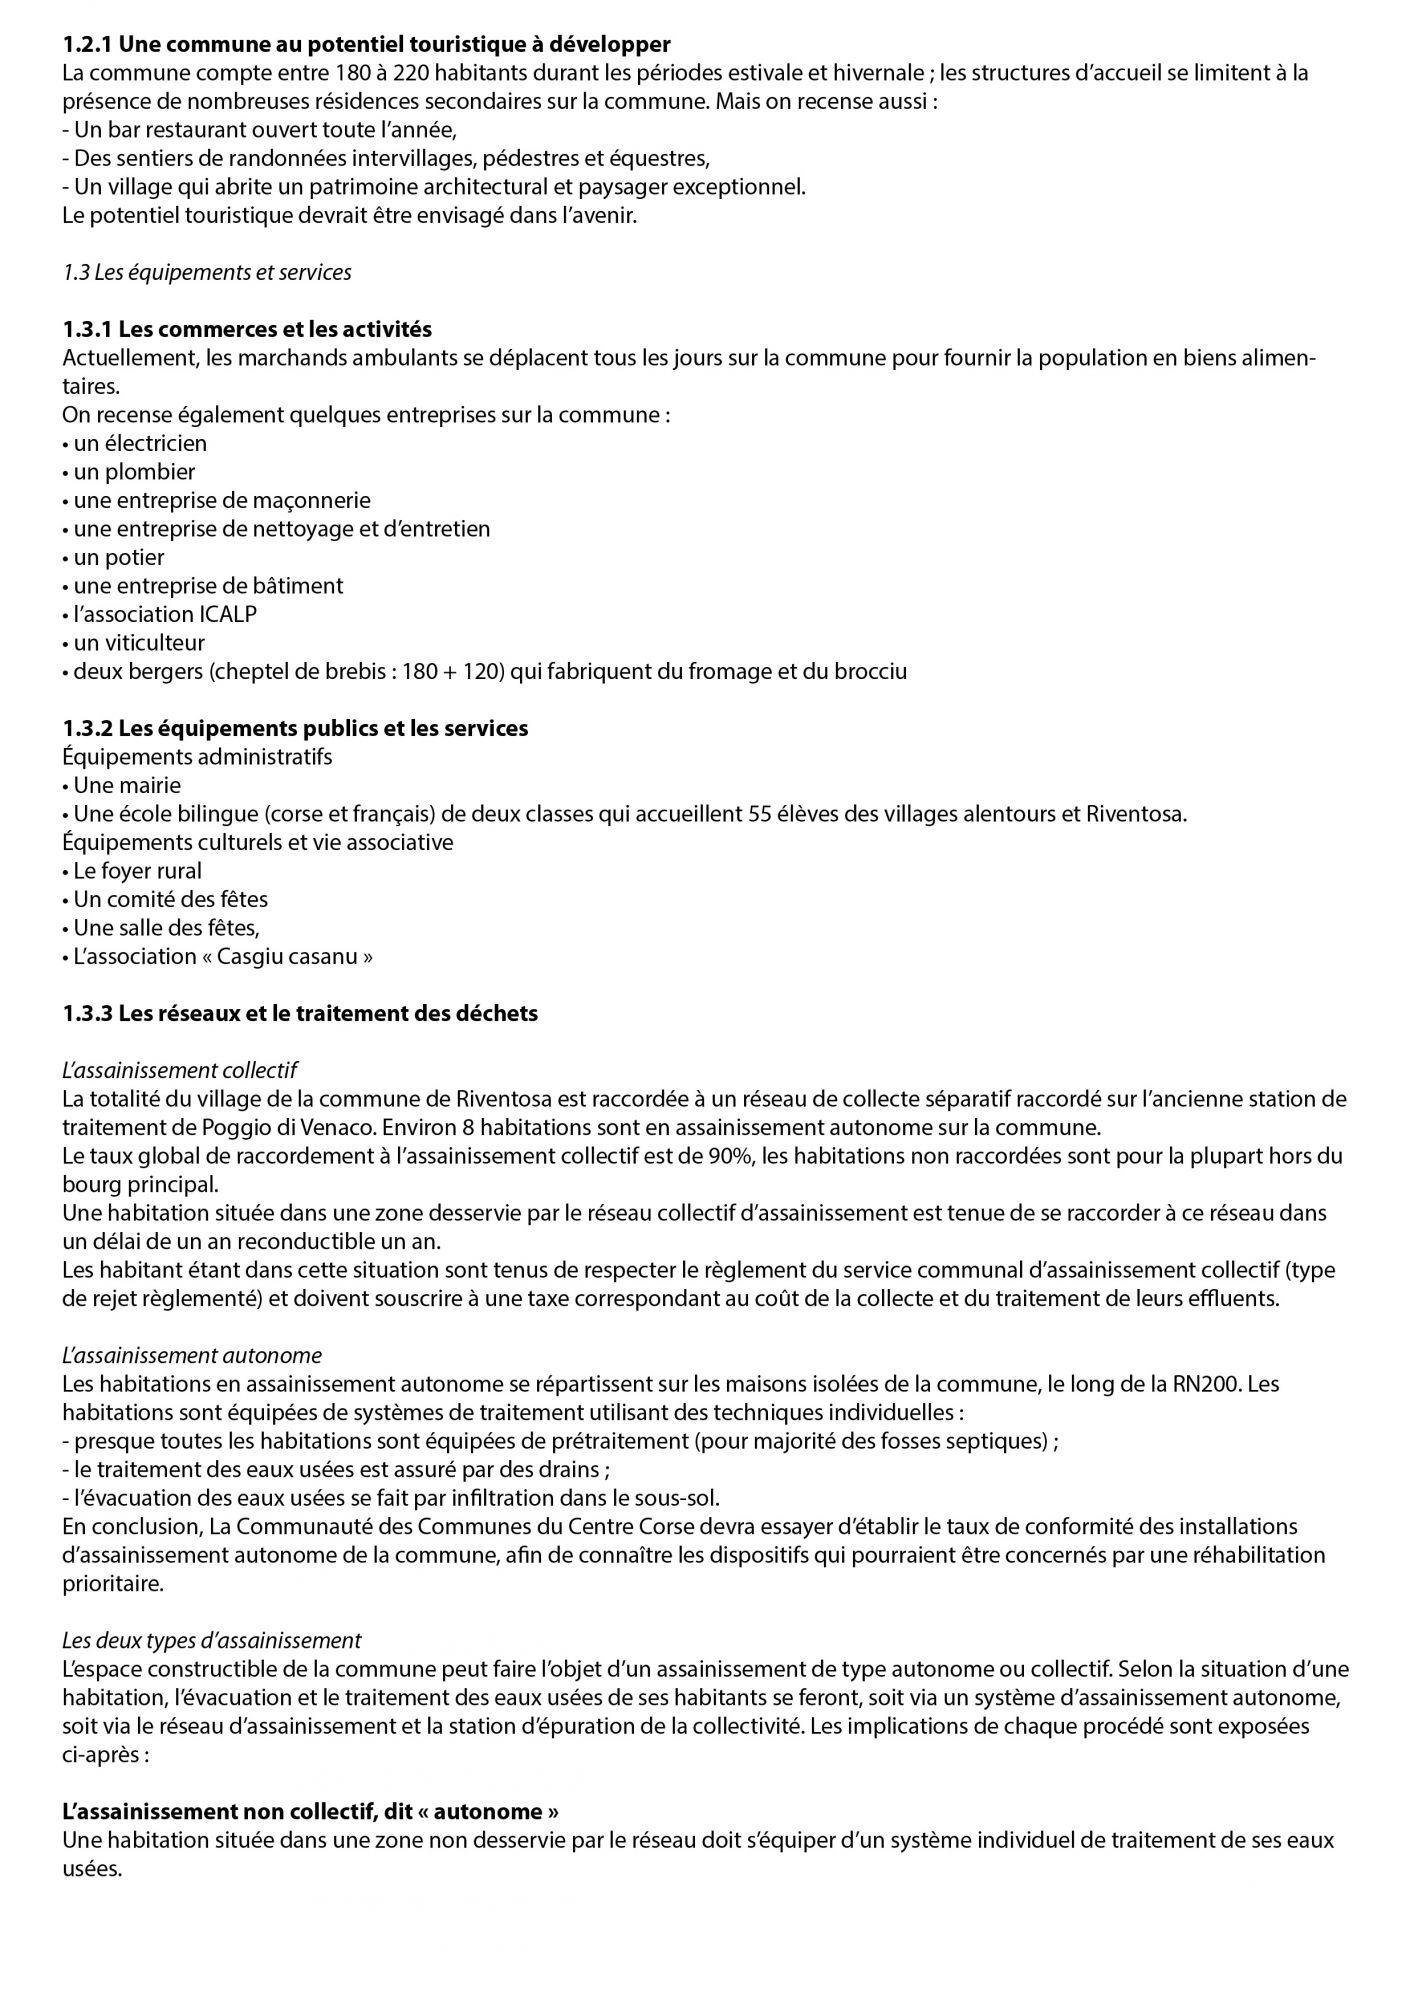 texte-carte-communale-6